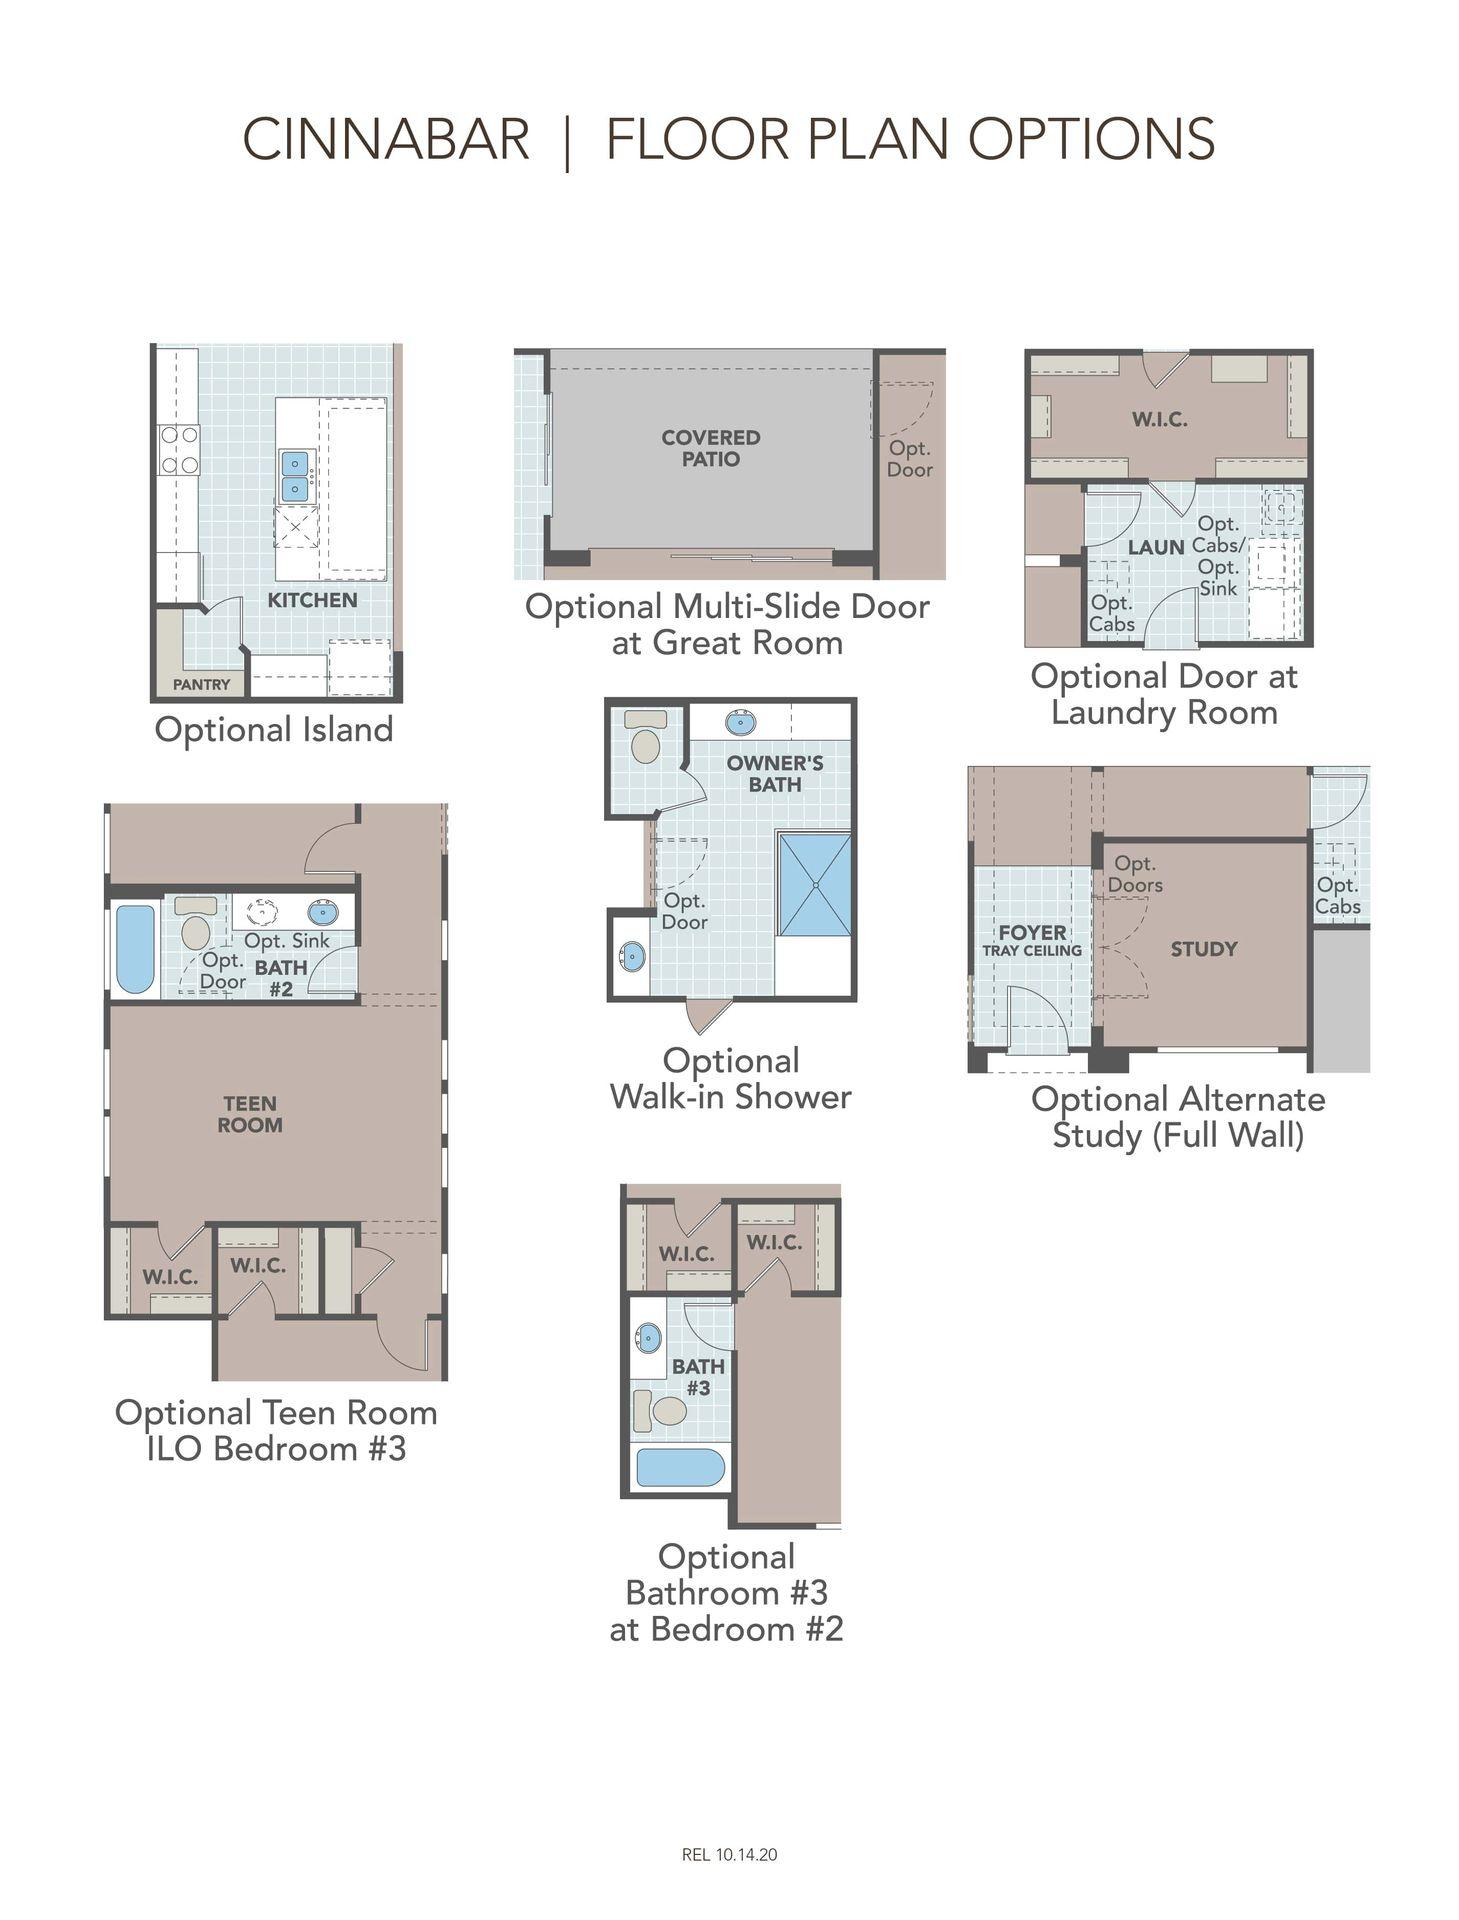 Hacienda Series - Cinnabar Plan